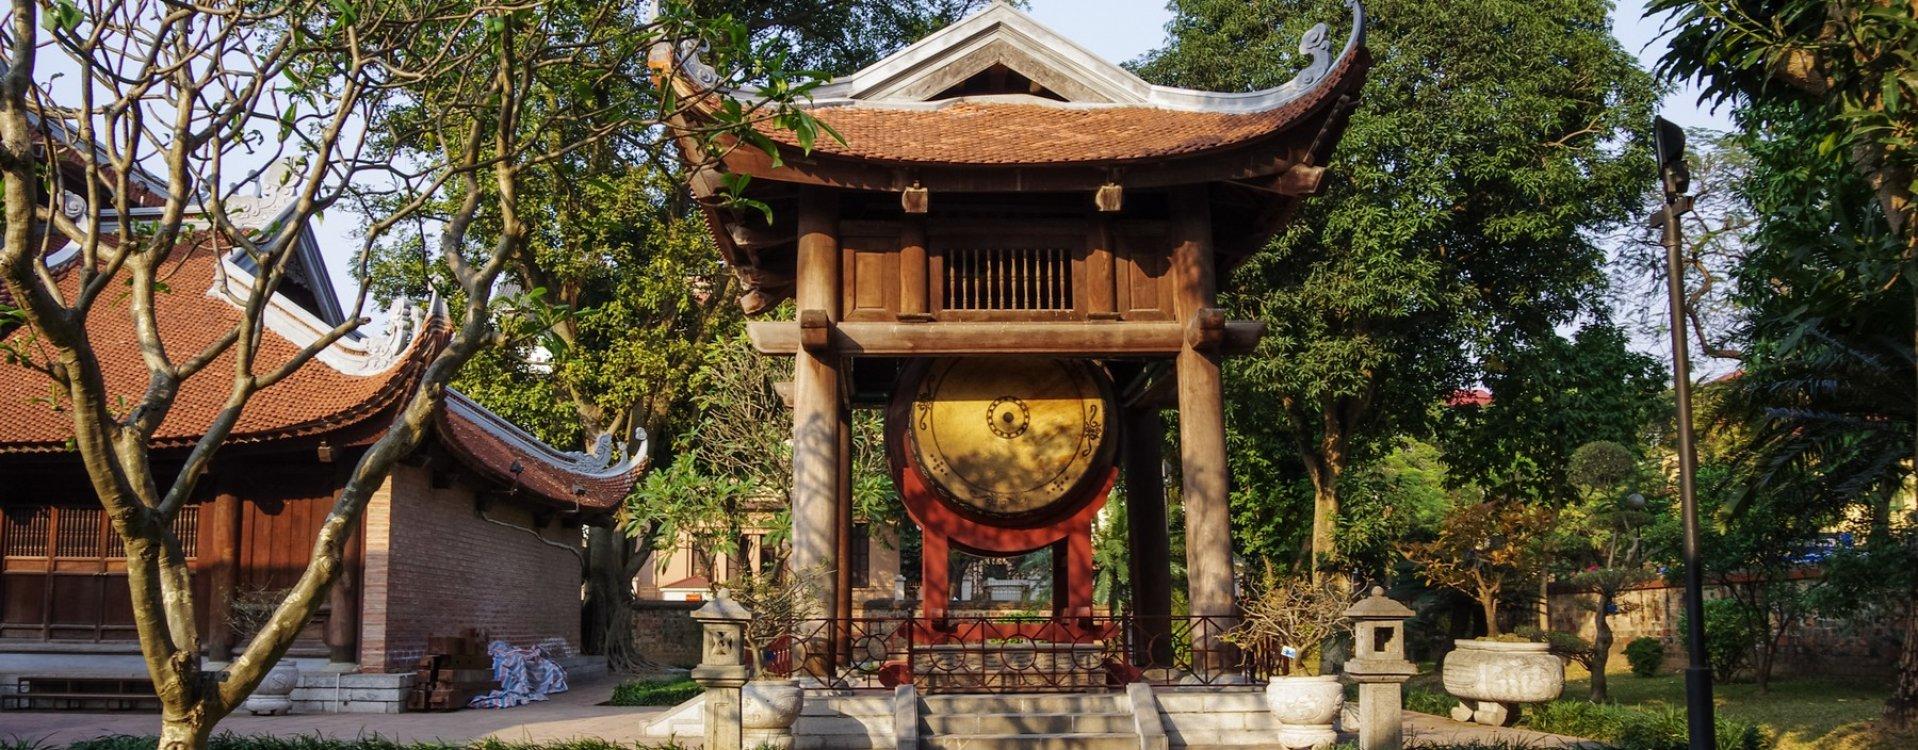 Tempel van de Literatuur in Hanoi